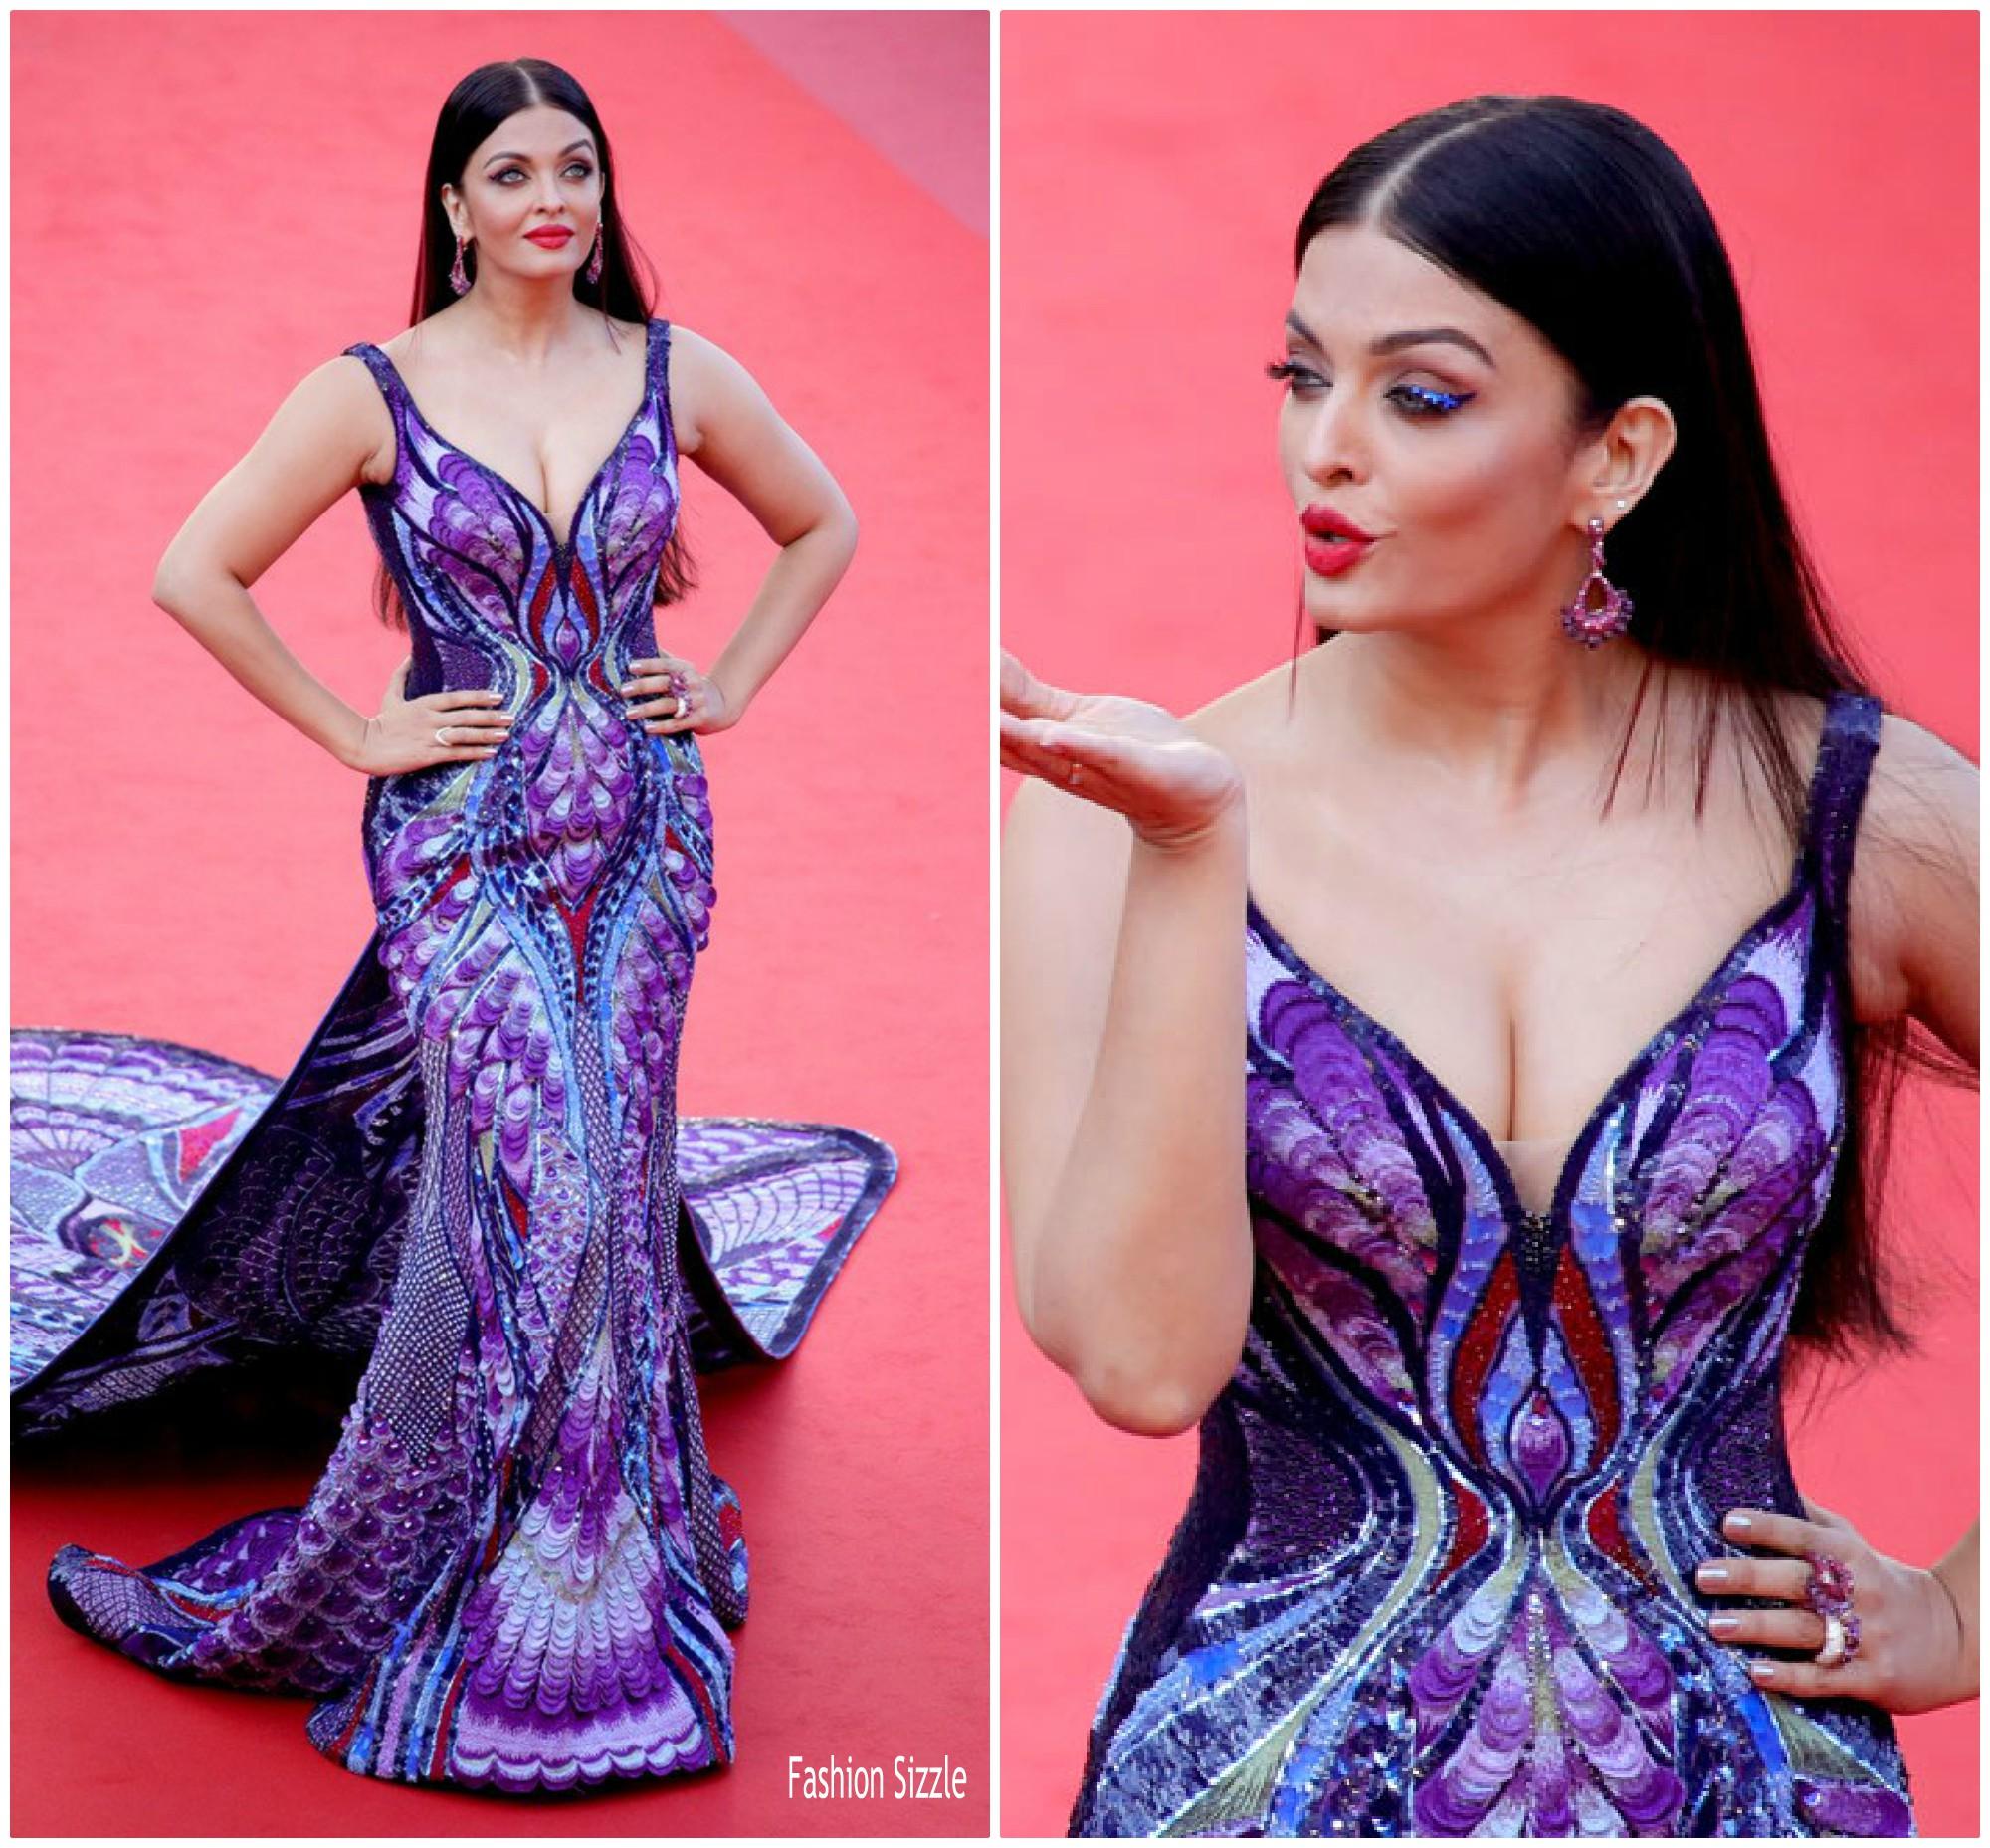 aishwarya-rai-bachchan-in-michael-cinco-couture-girls-of-the-sun-les-filles-du-soleil-cannes-film-festival-premiere